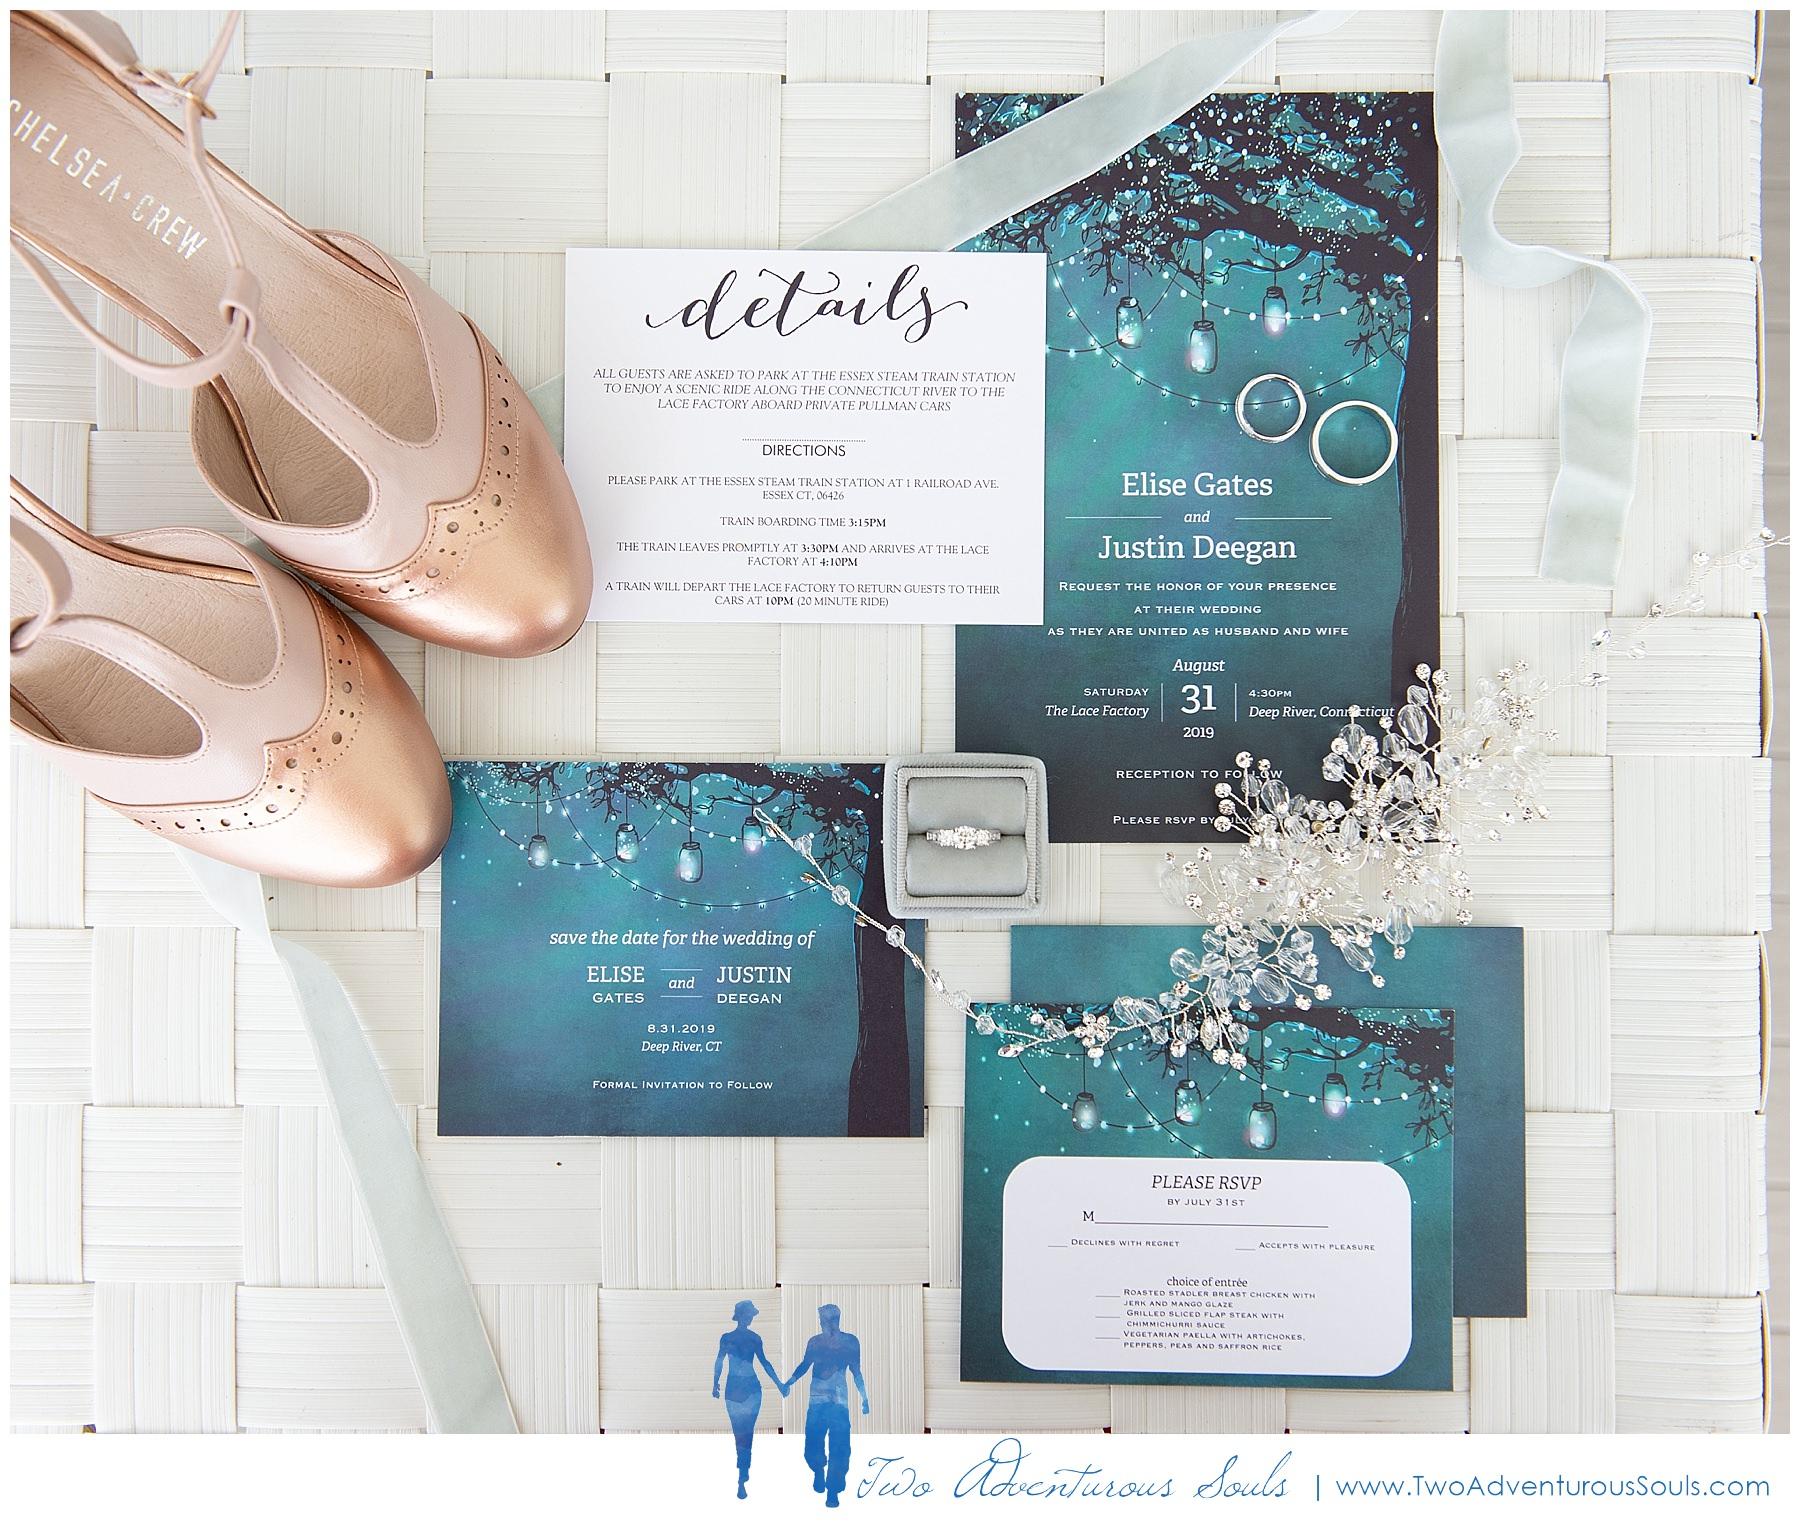 Connecticut Wedding Photographers, Lace Factory Wedding Photographers, Two Adventurous Souls - 083119_0003.jpg